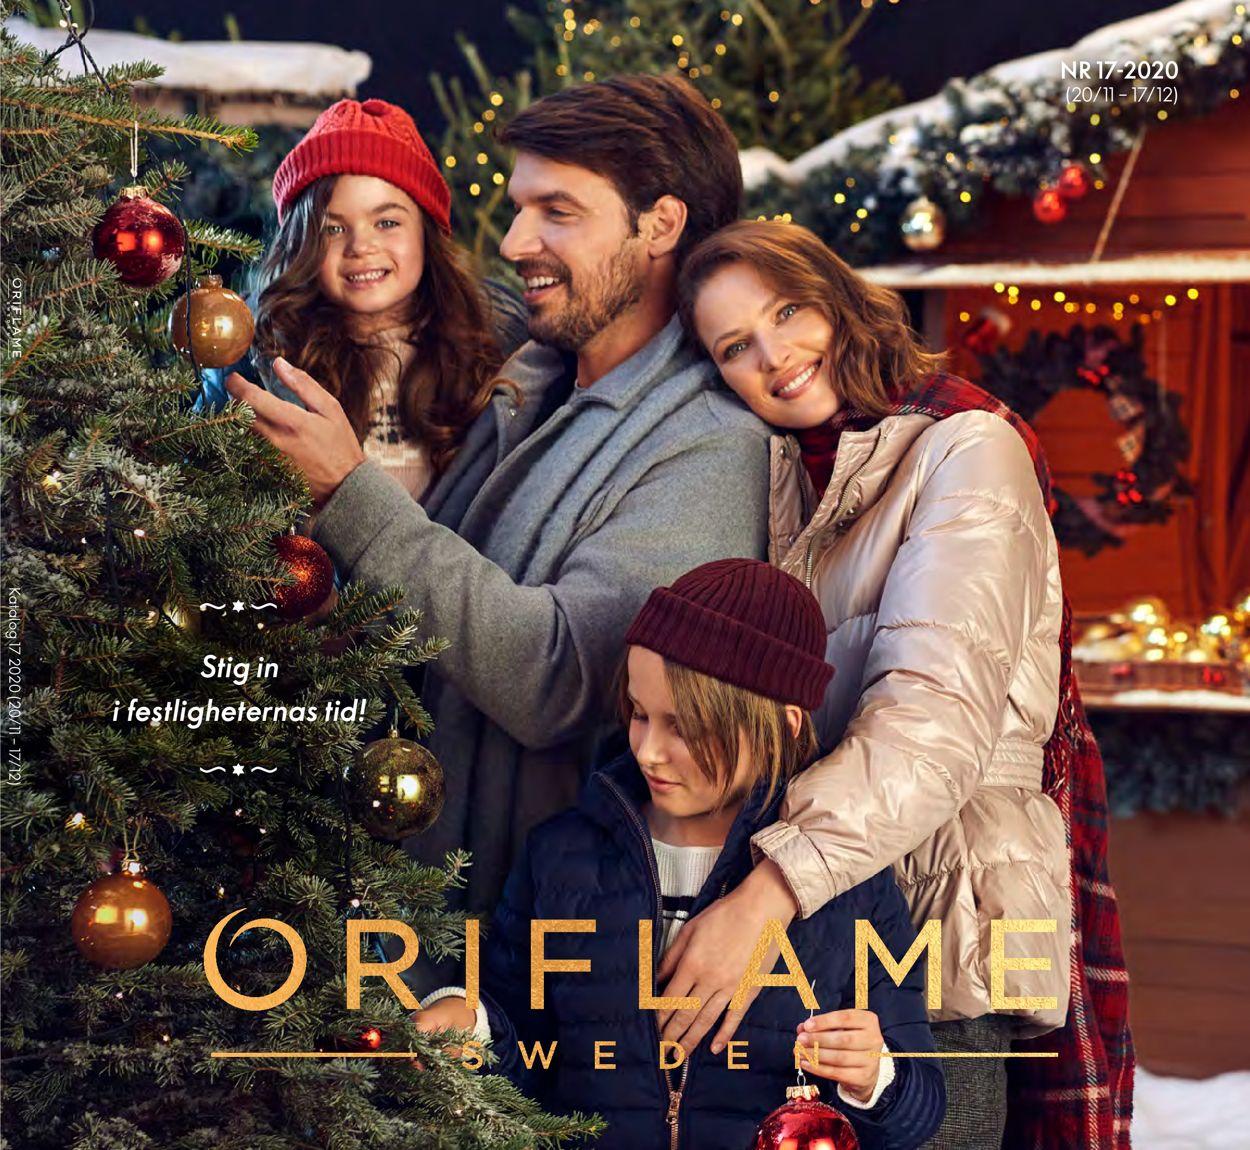 Oriflame Julen 2020 - Reklamblad - 20/11-17/12-2020